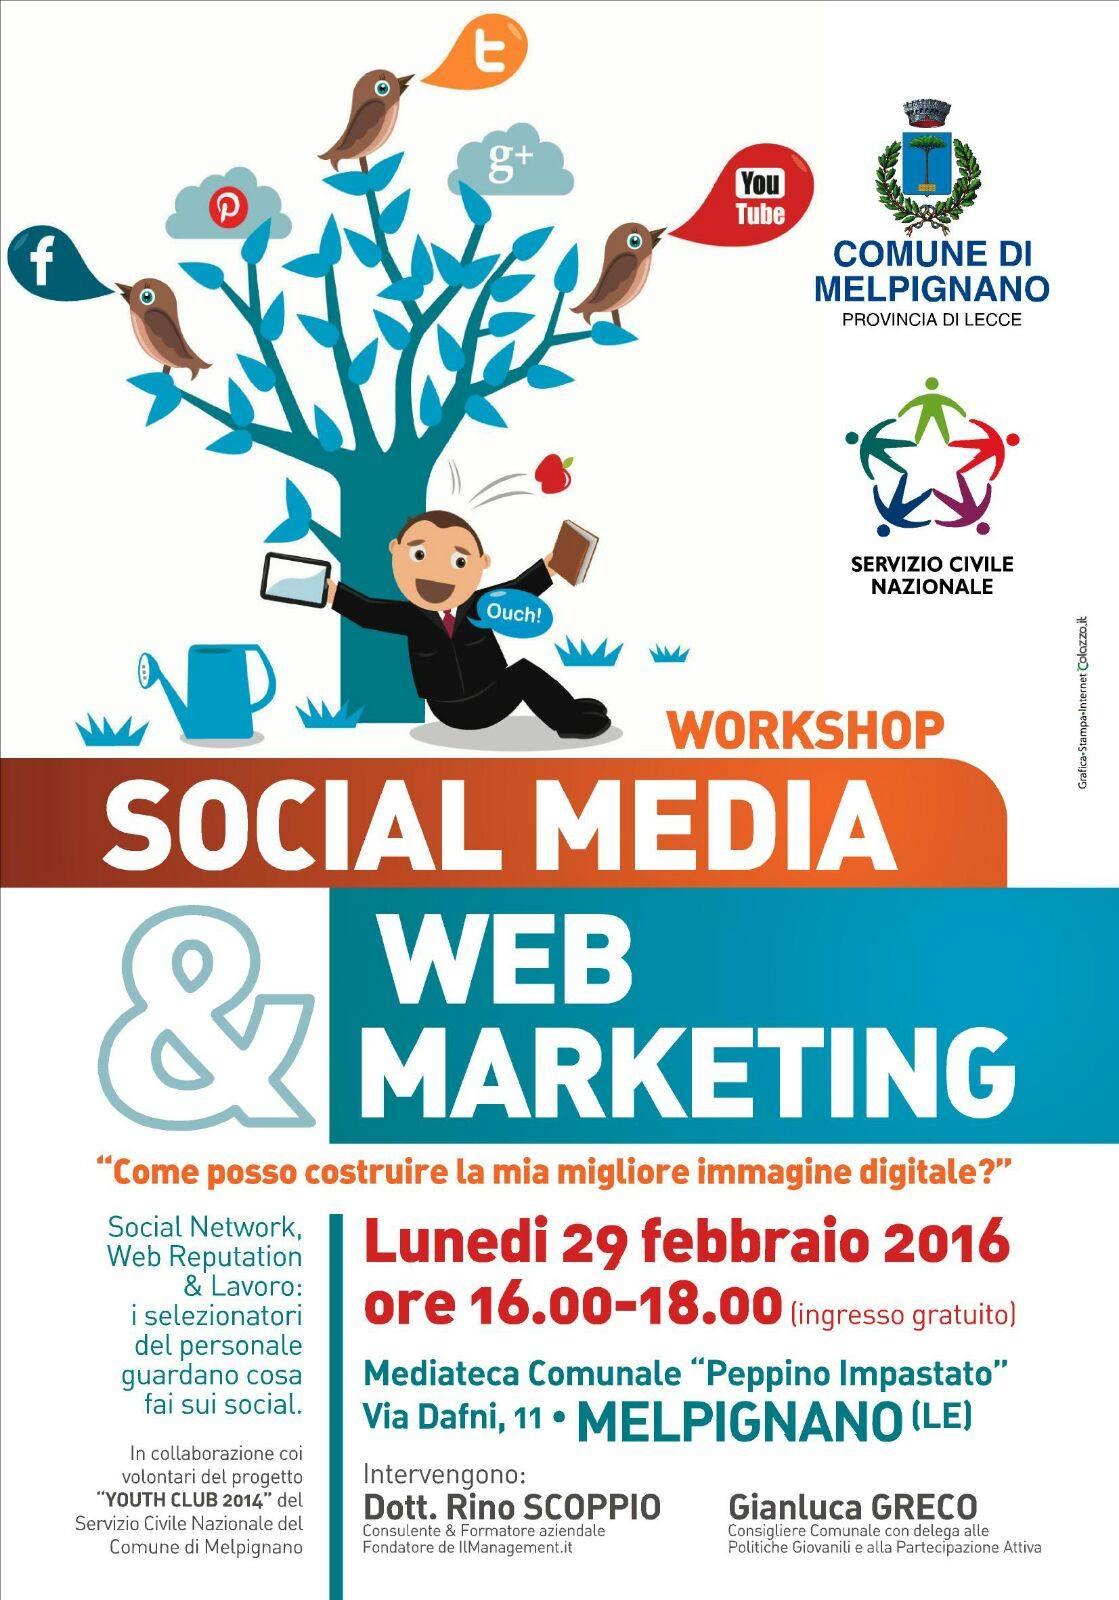 melpignano-workshop